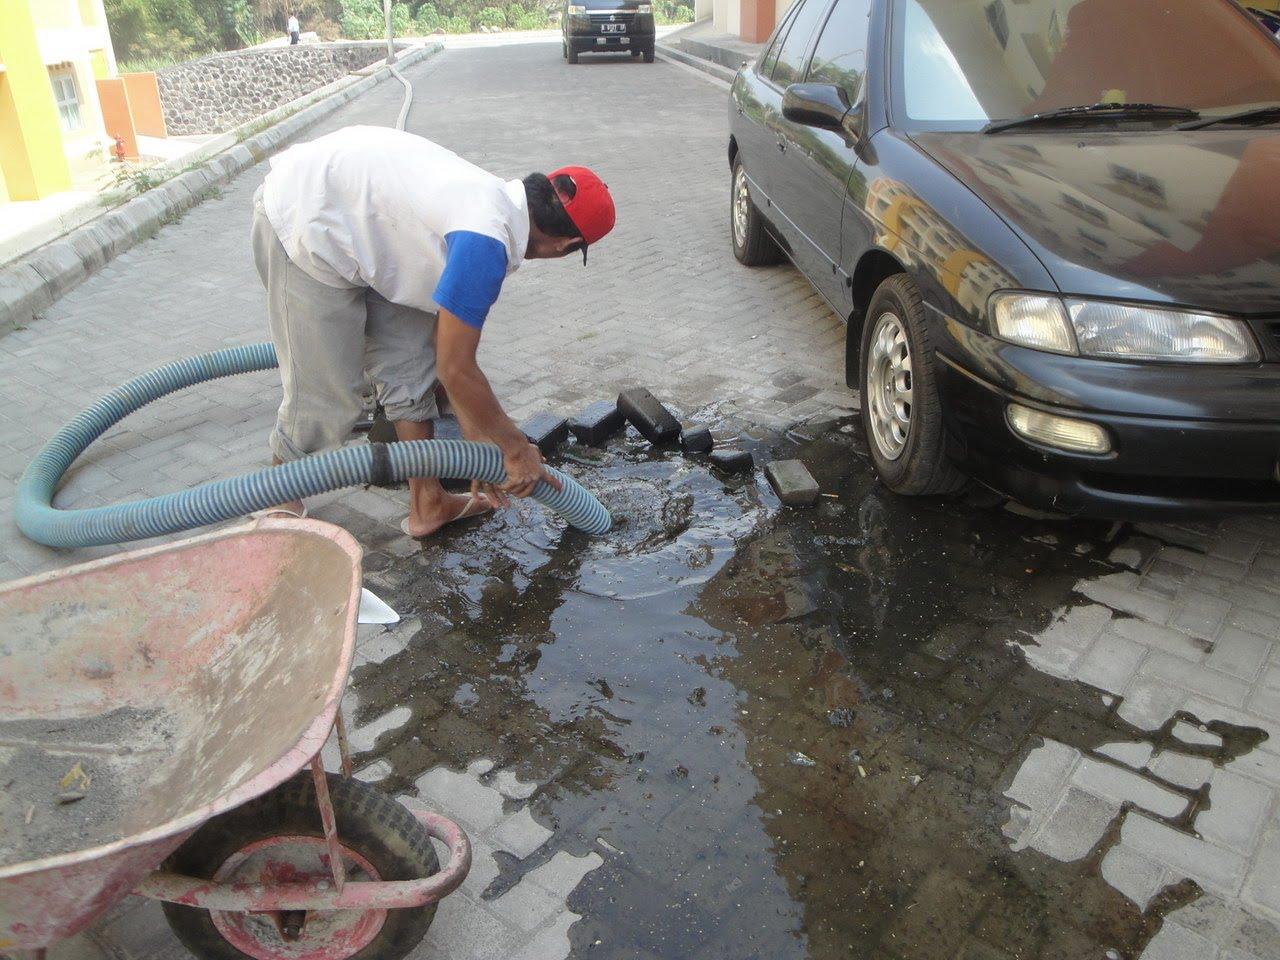 rusunawa sleman : perbaikan saluran pembuangan air kotor yang tersumbat